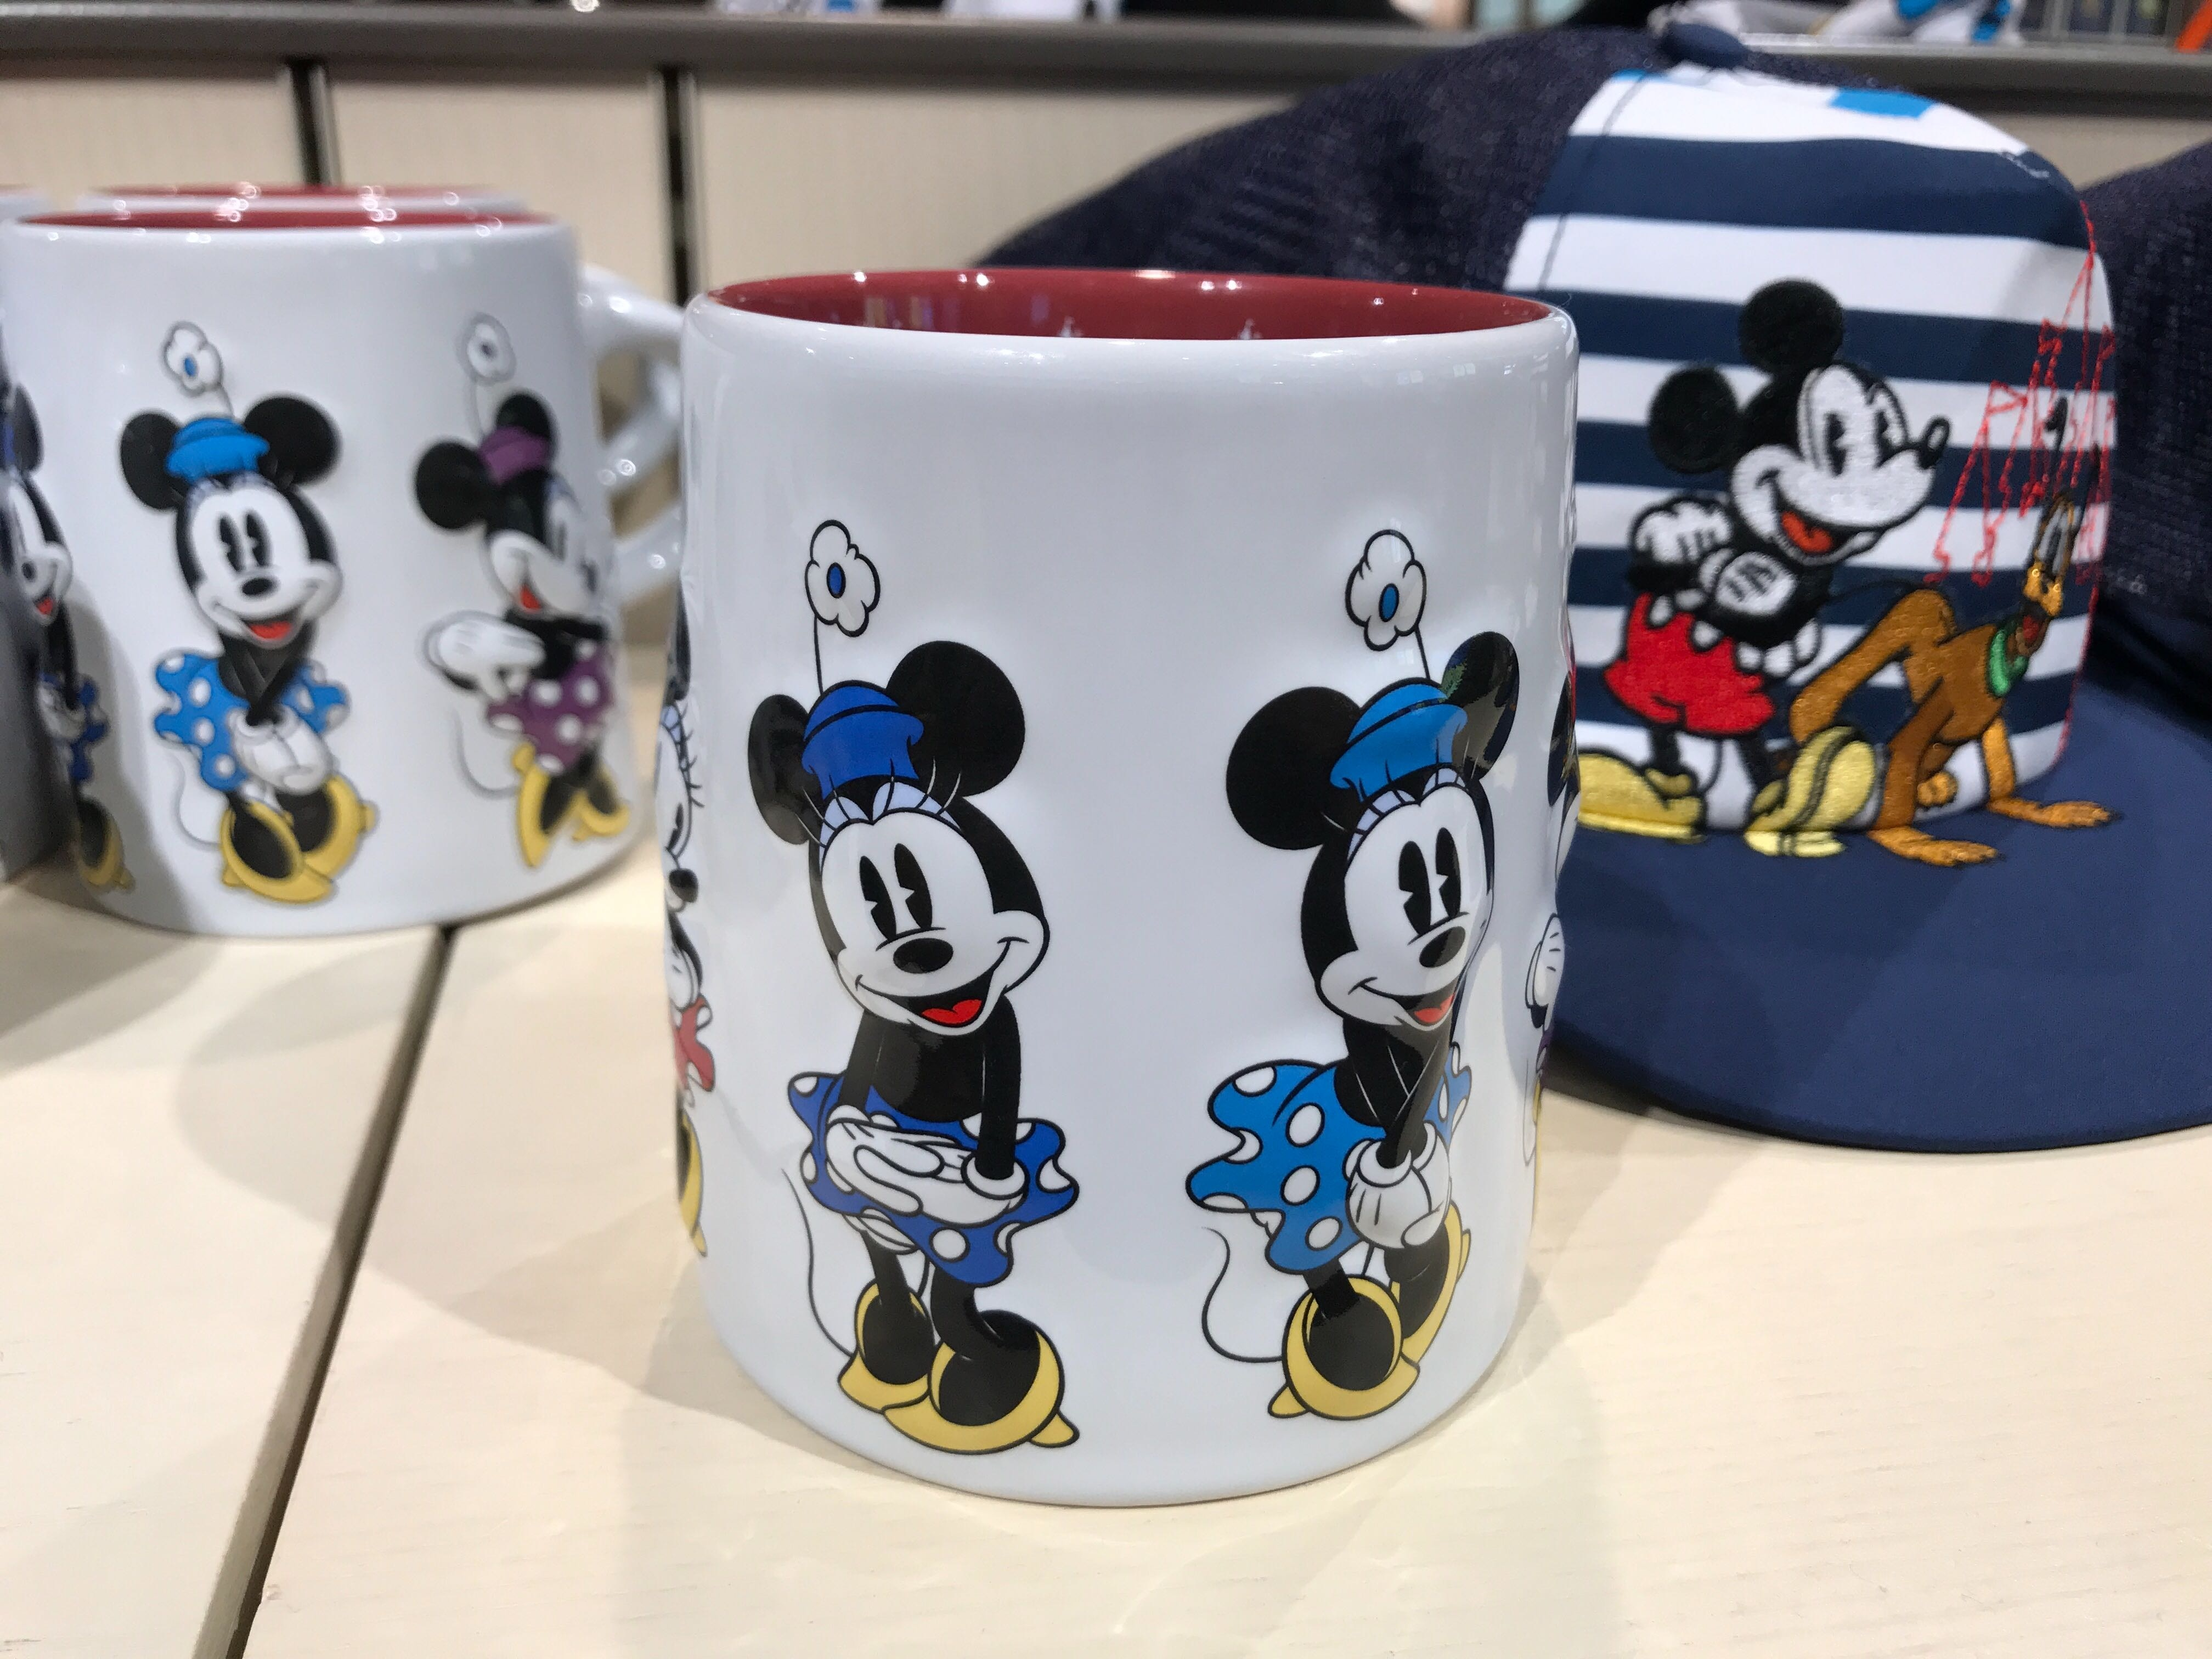 Retro Rainbow Minnie Mug - $14.99